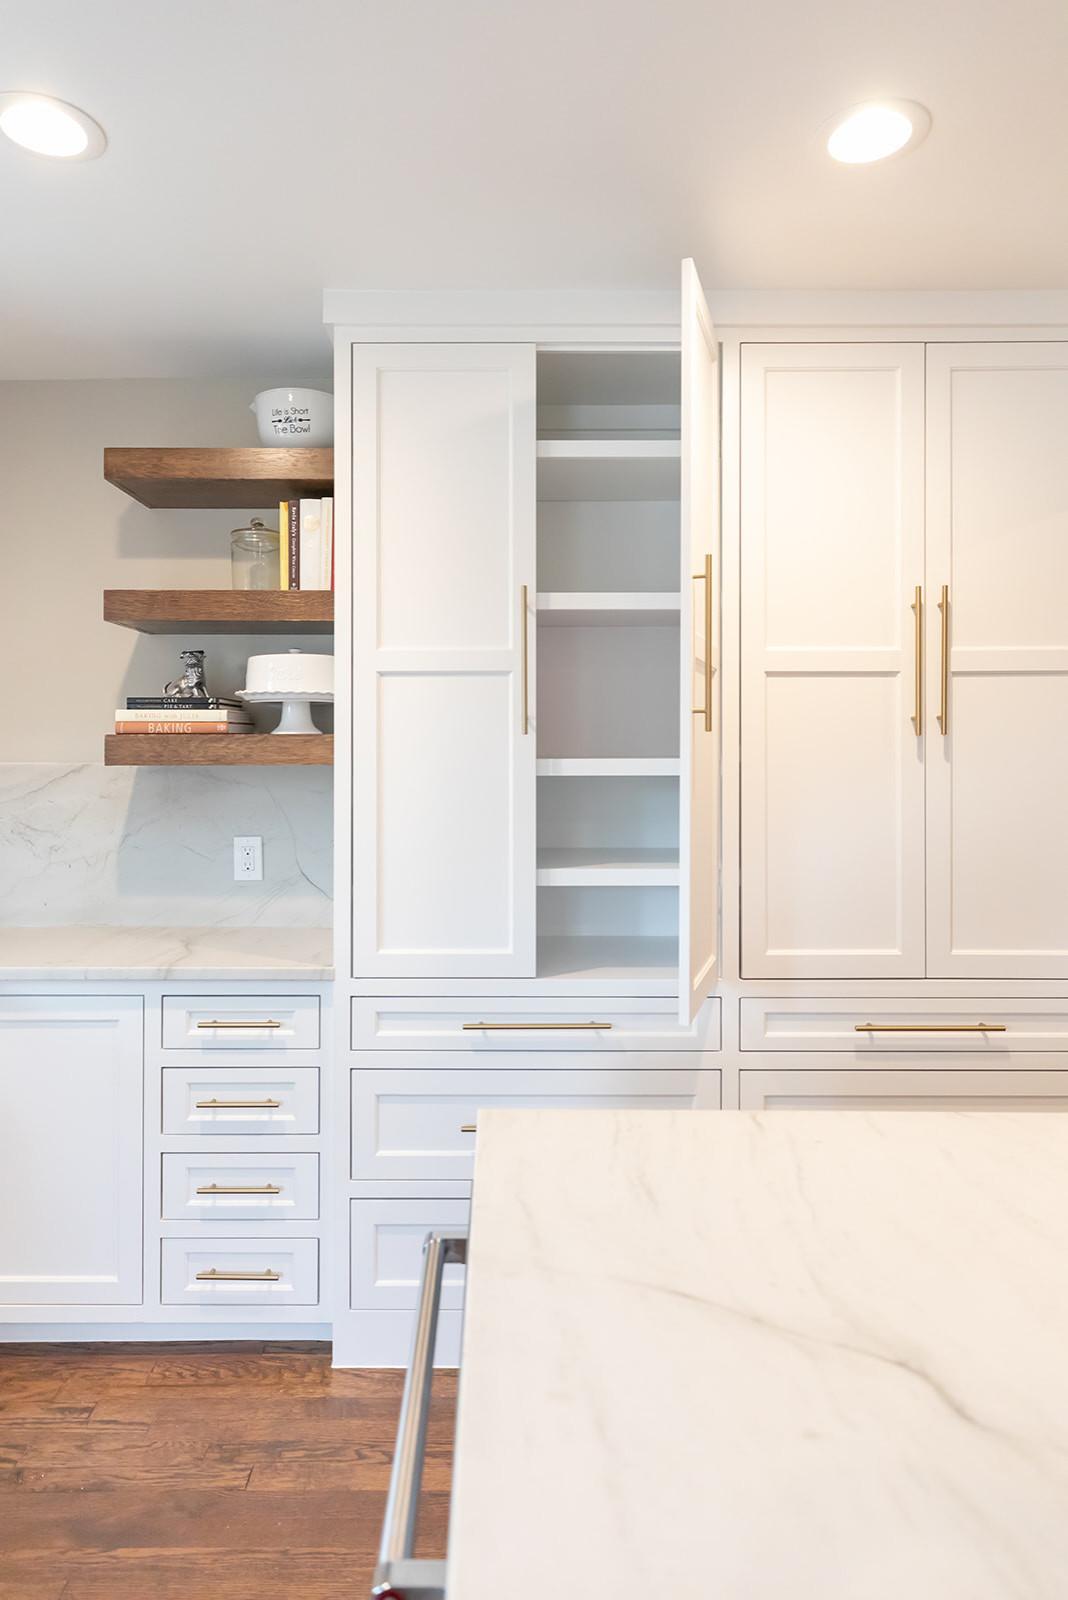 Transitional Kitchen Remodel: Lakewood Mercedes Drive